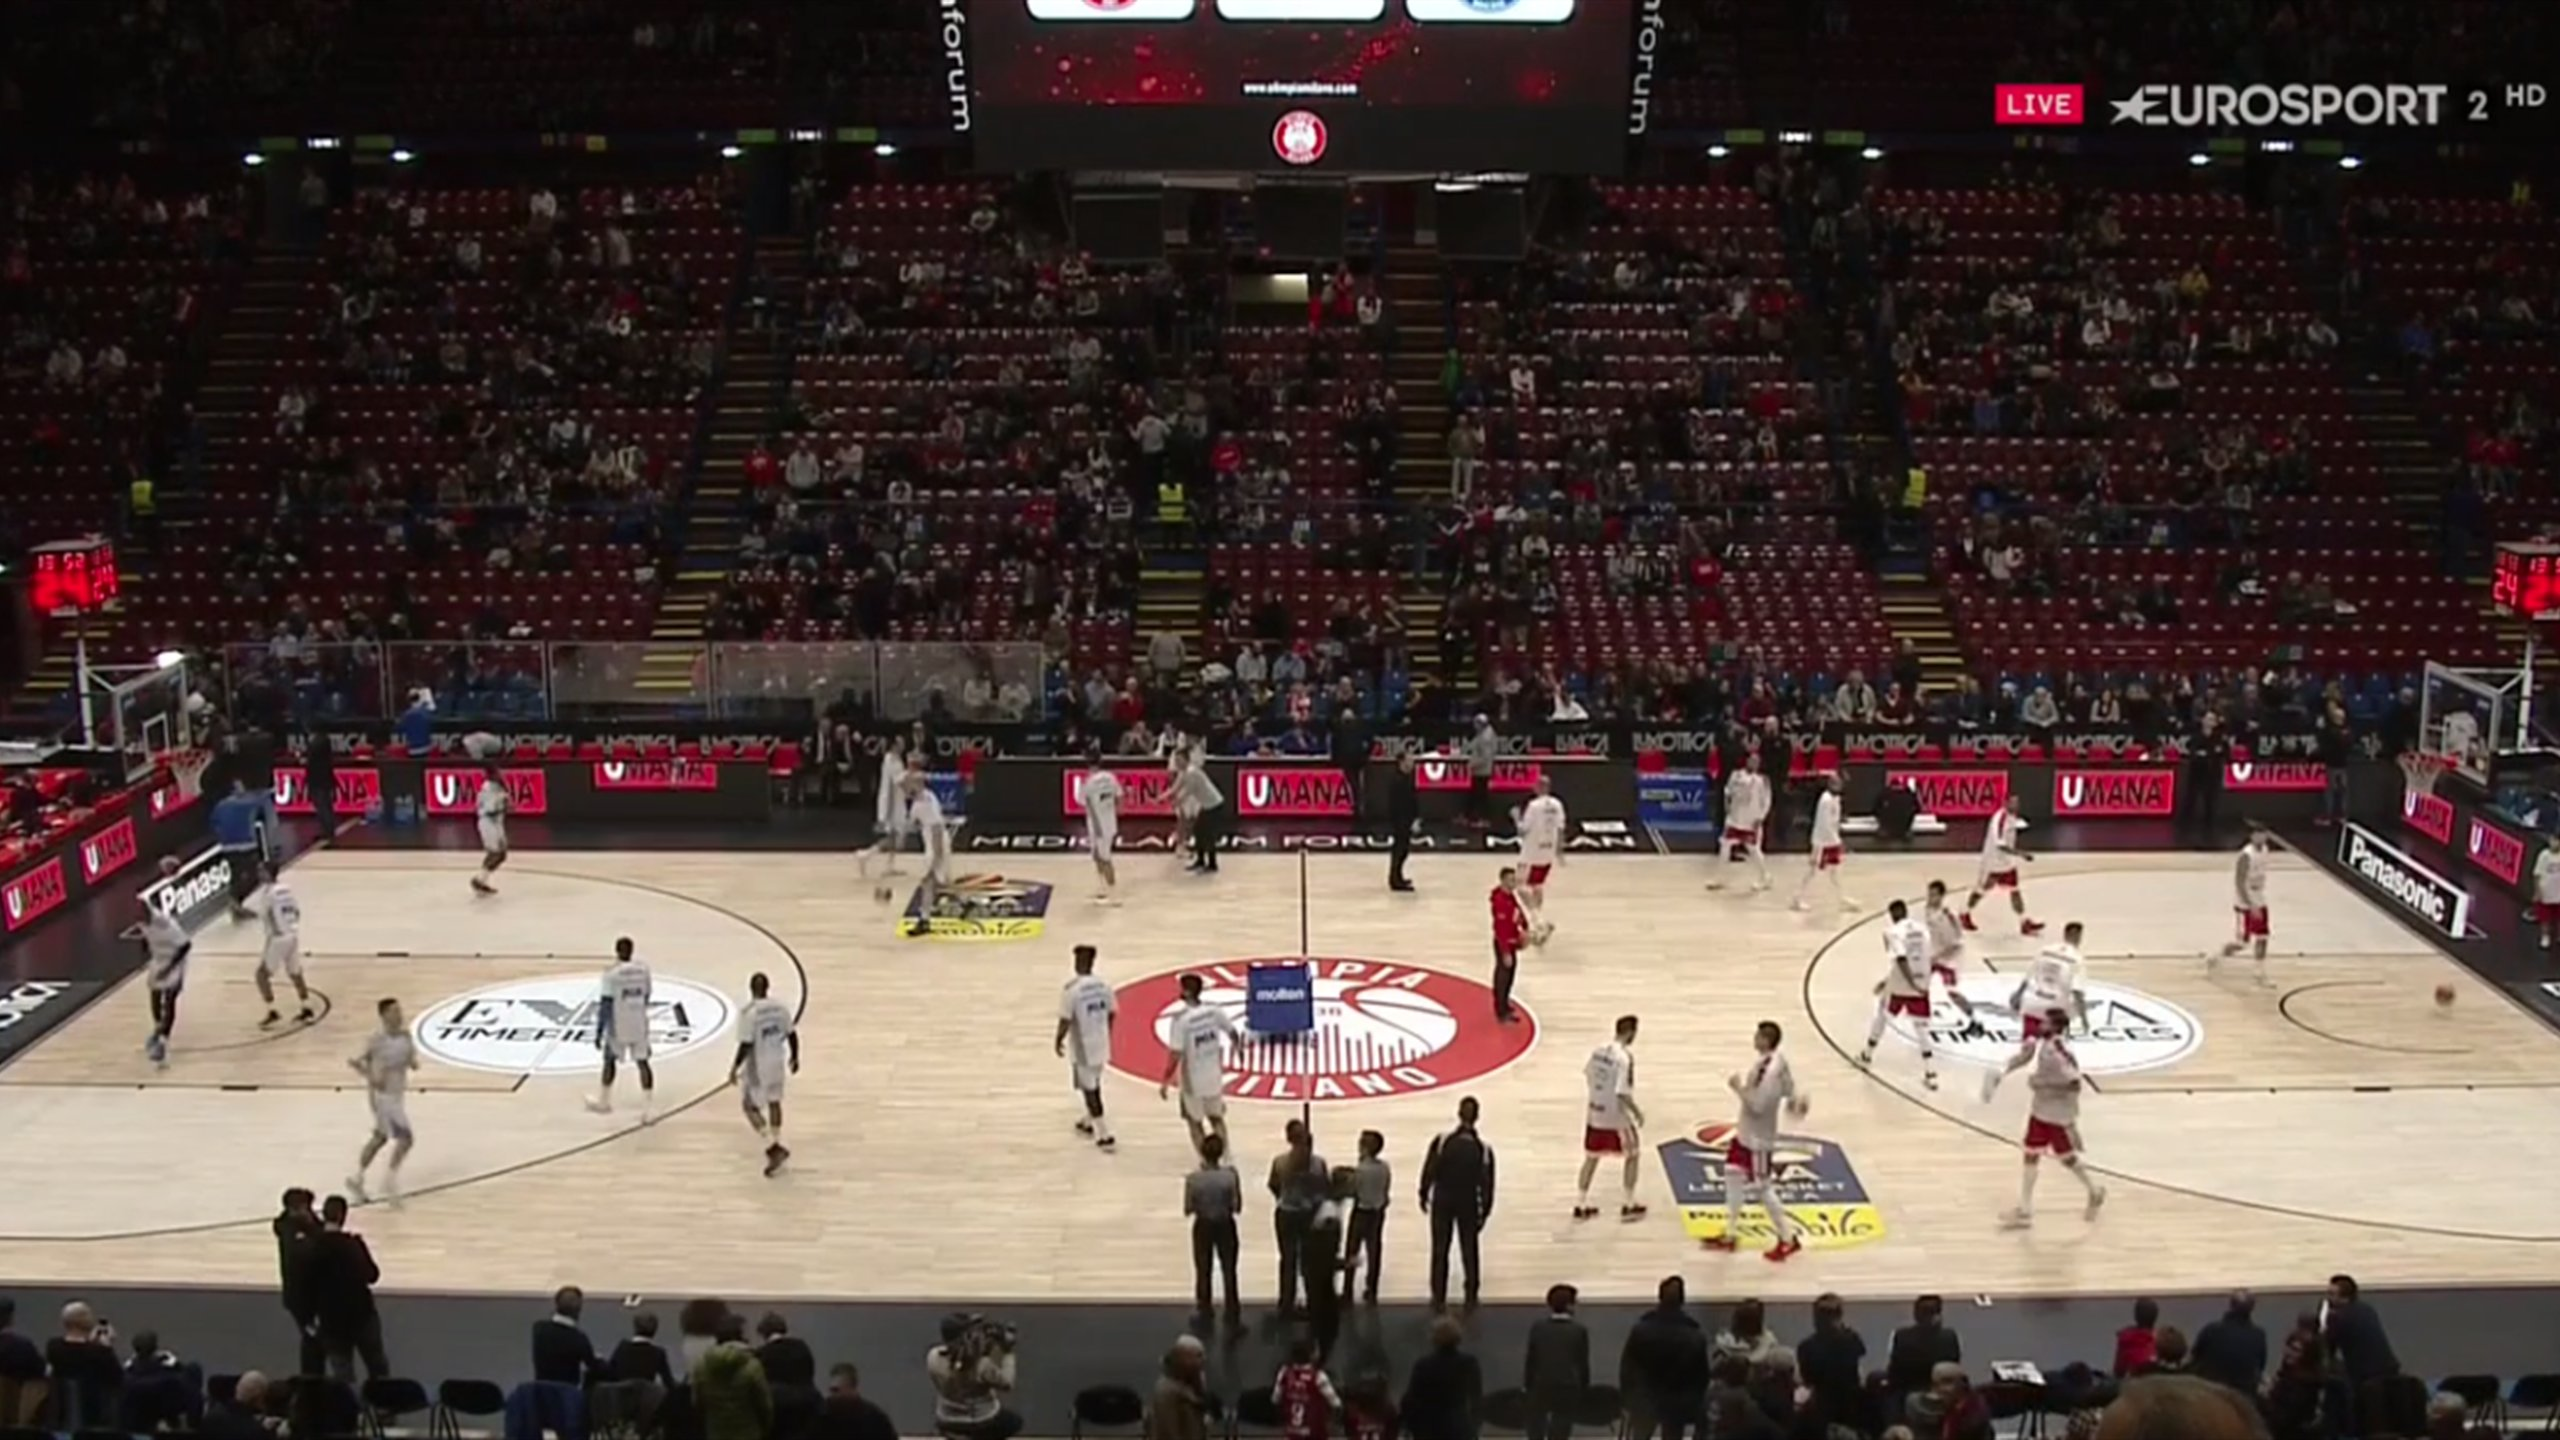 Lega Basket Serie A, a Eurosport il pacchetto Pay per le prossime due stagioni